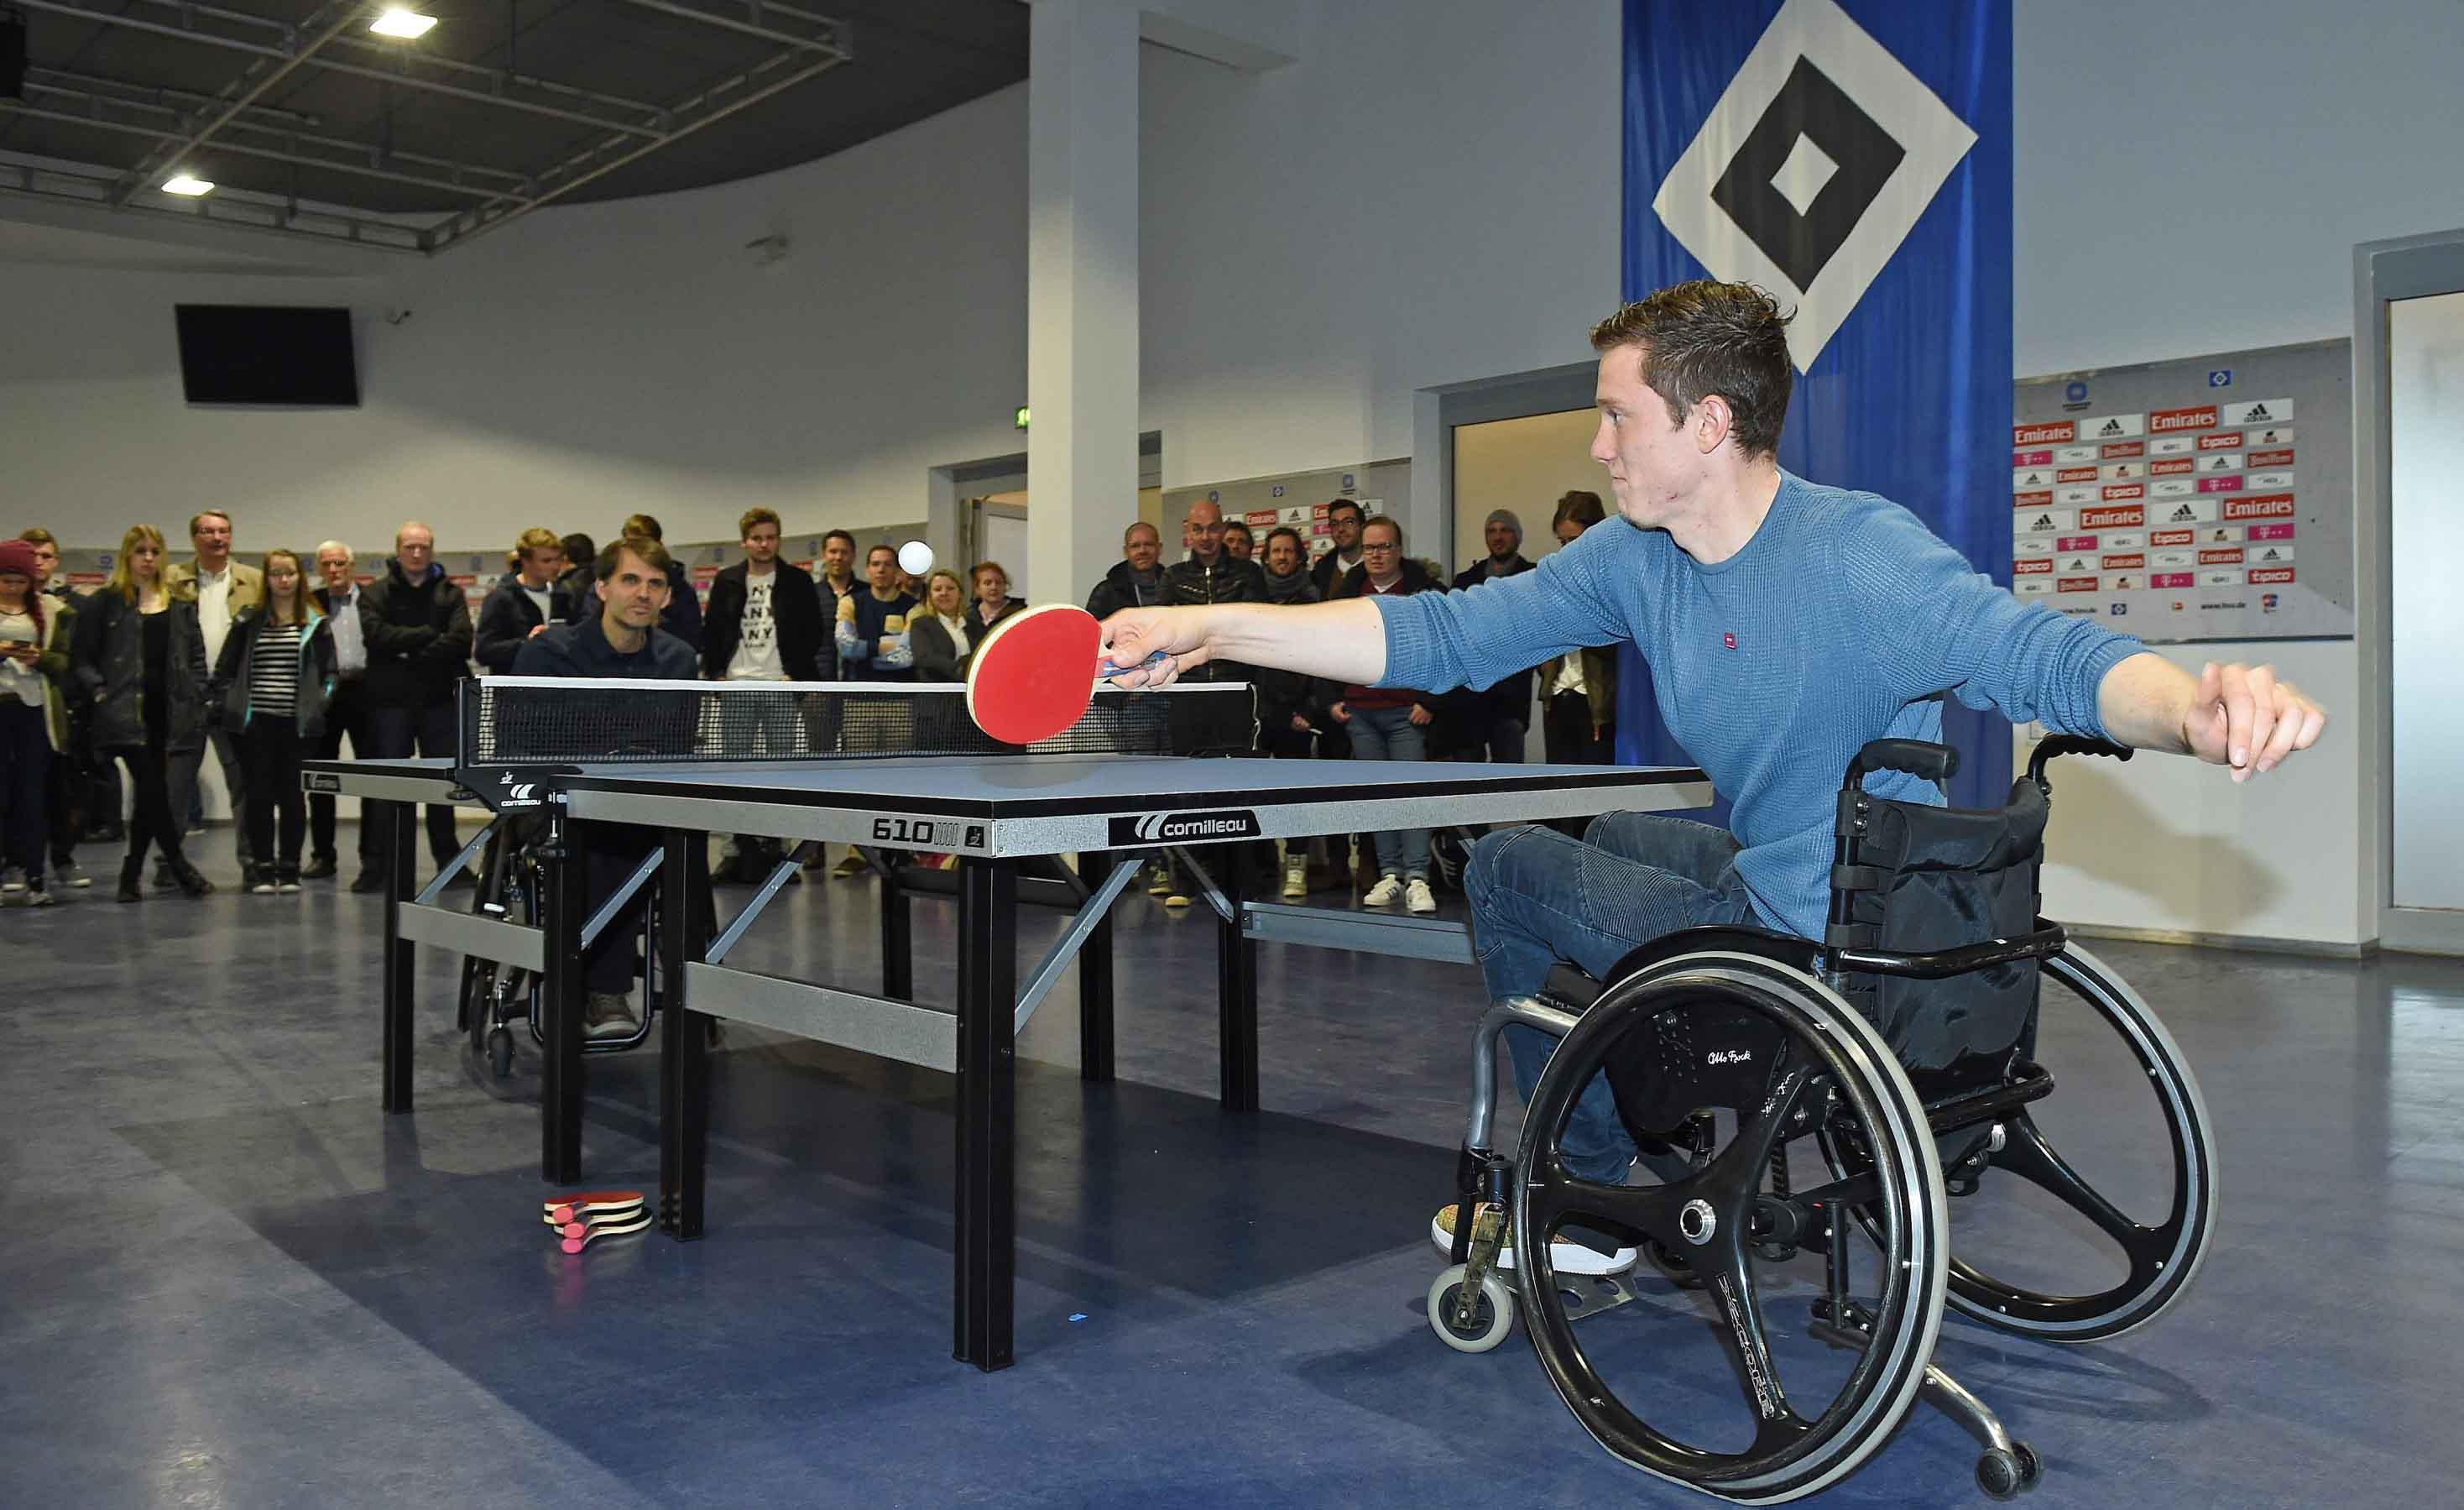 v.l. Holger Nikelis (Paralympics Rollstuhl-Tischtennis), Michael Gregoritsch (HSV)